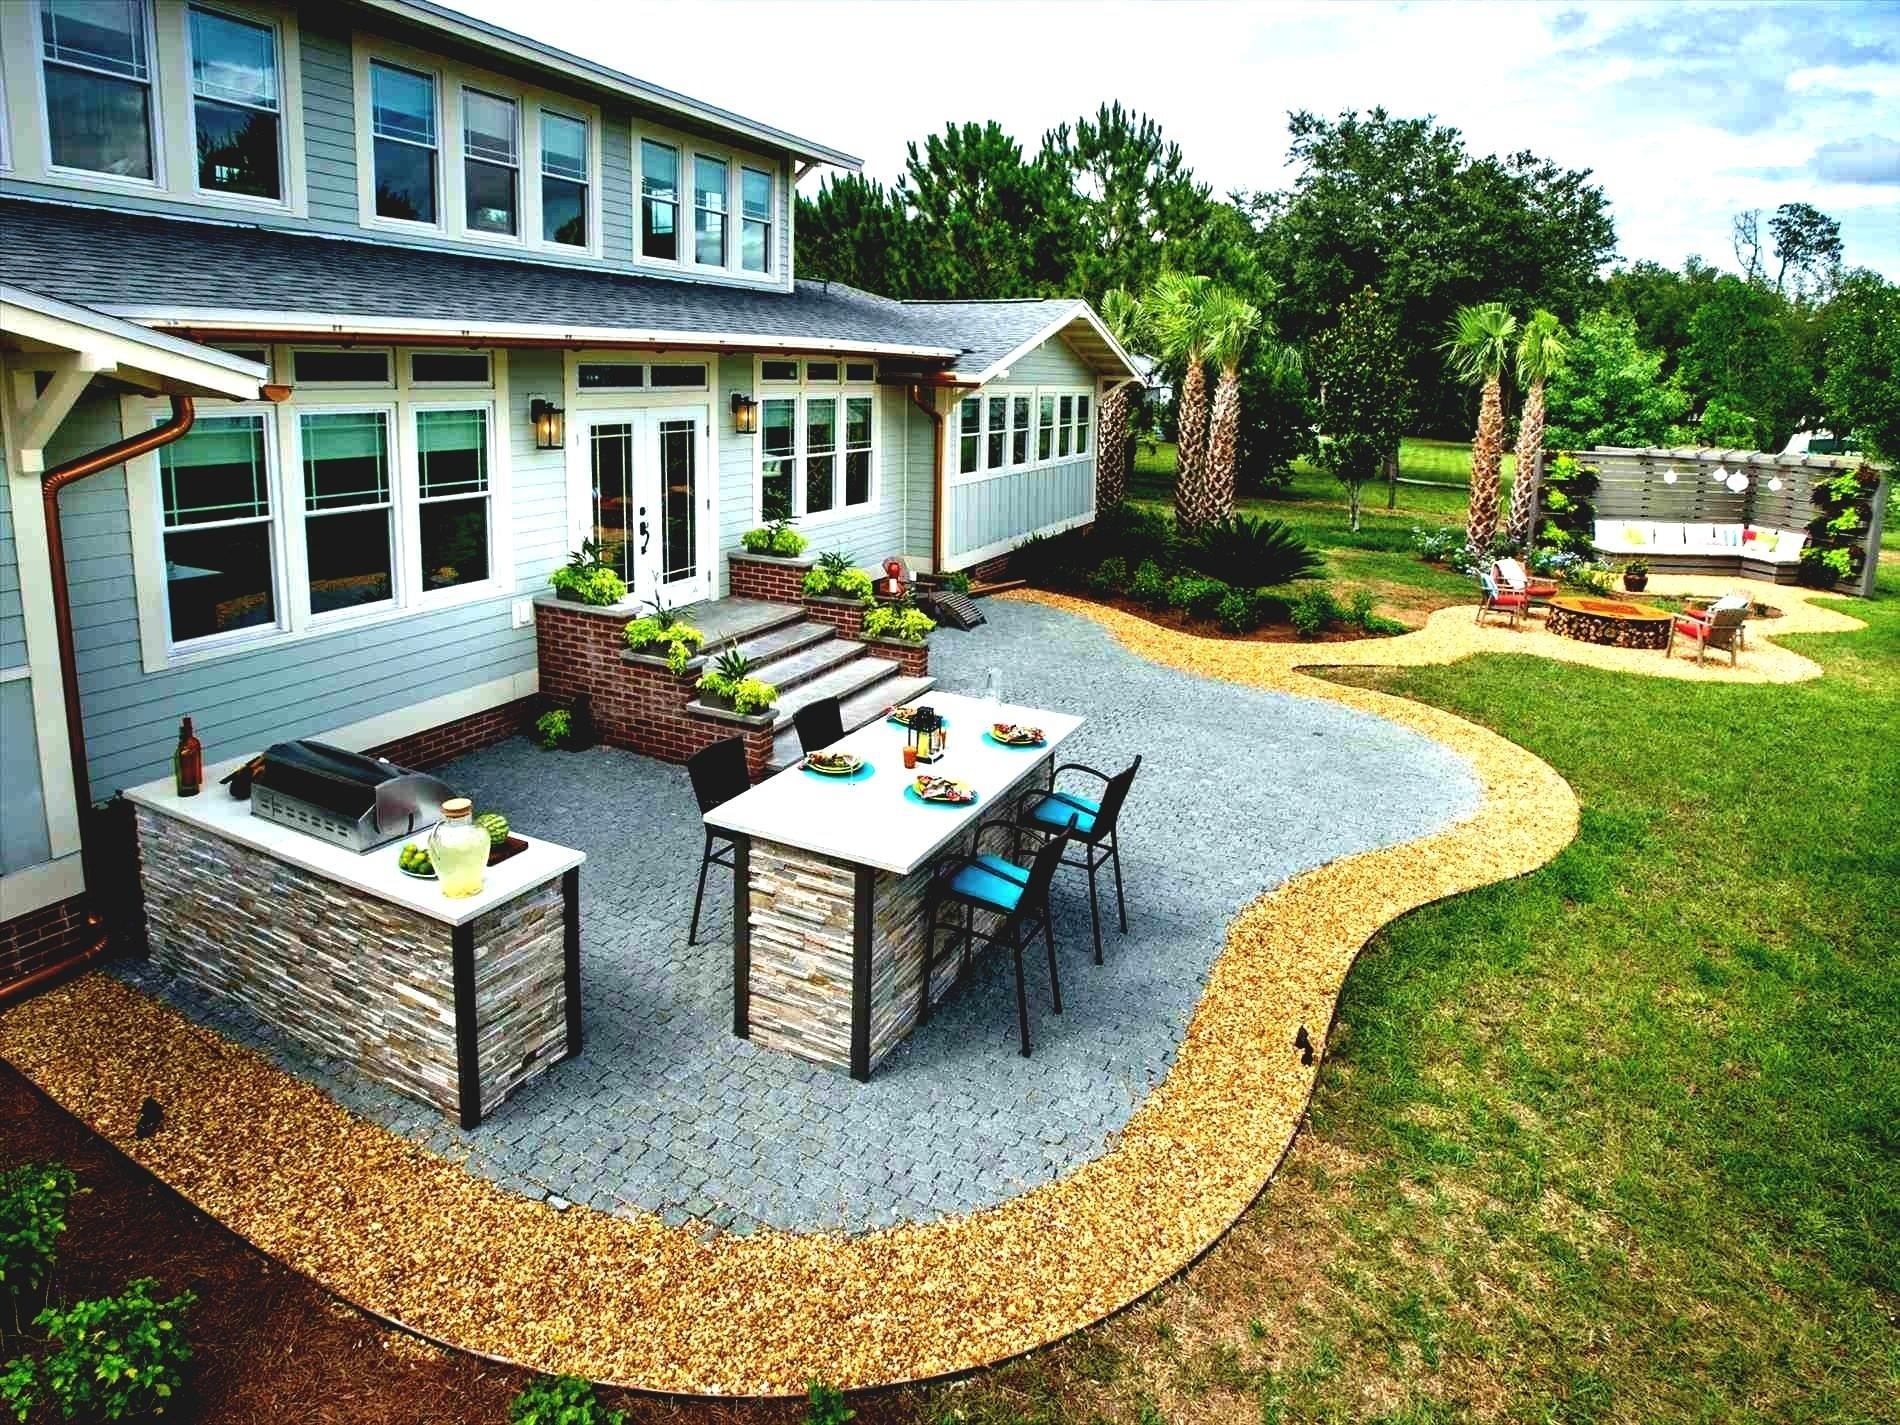 backyard small diy patio ideas design and concrete on a budget